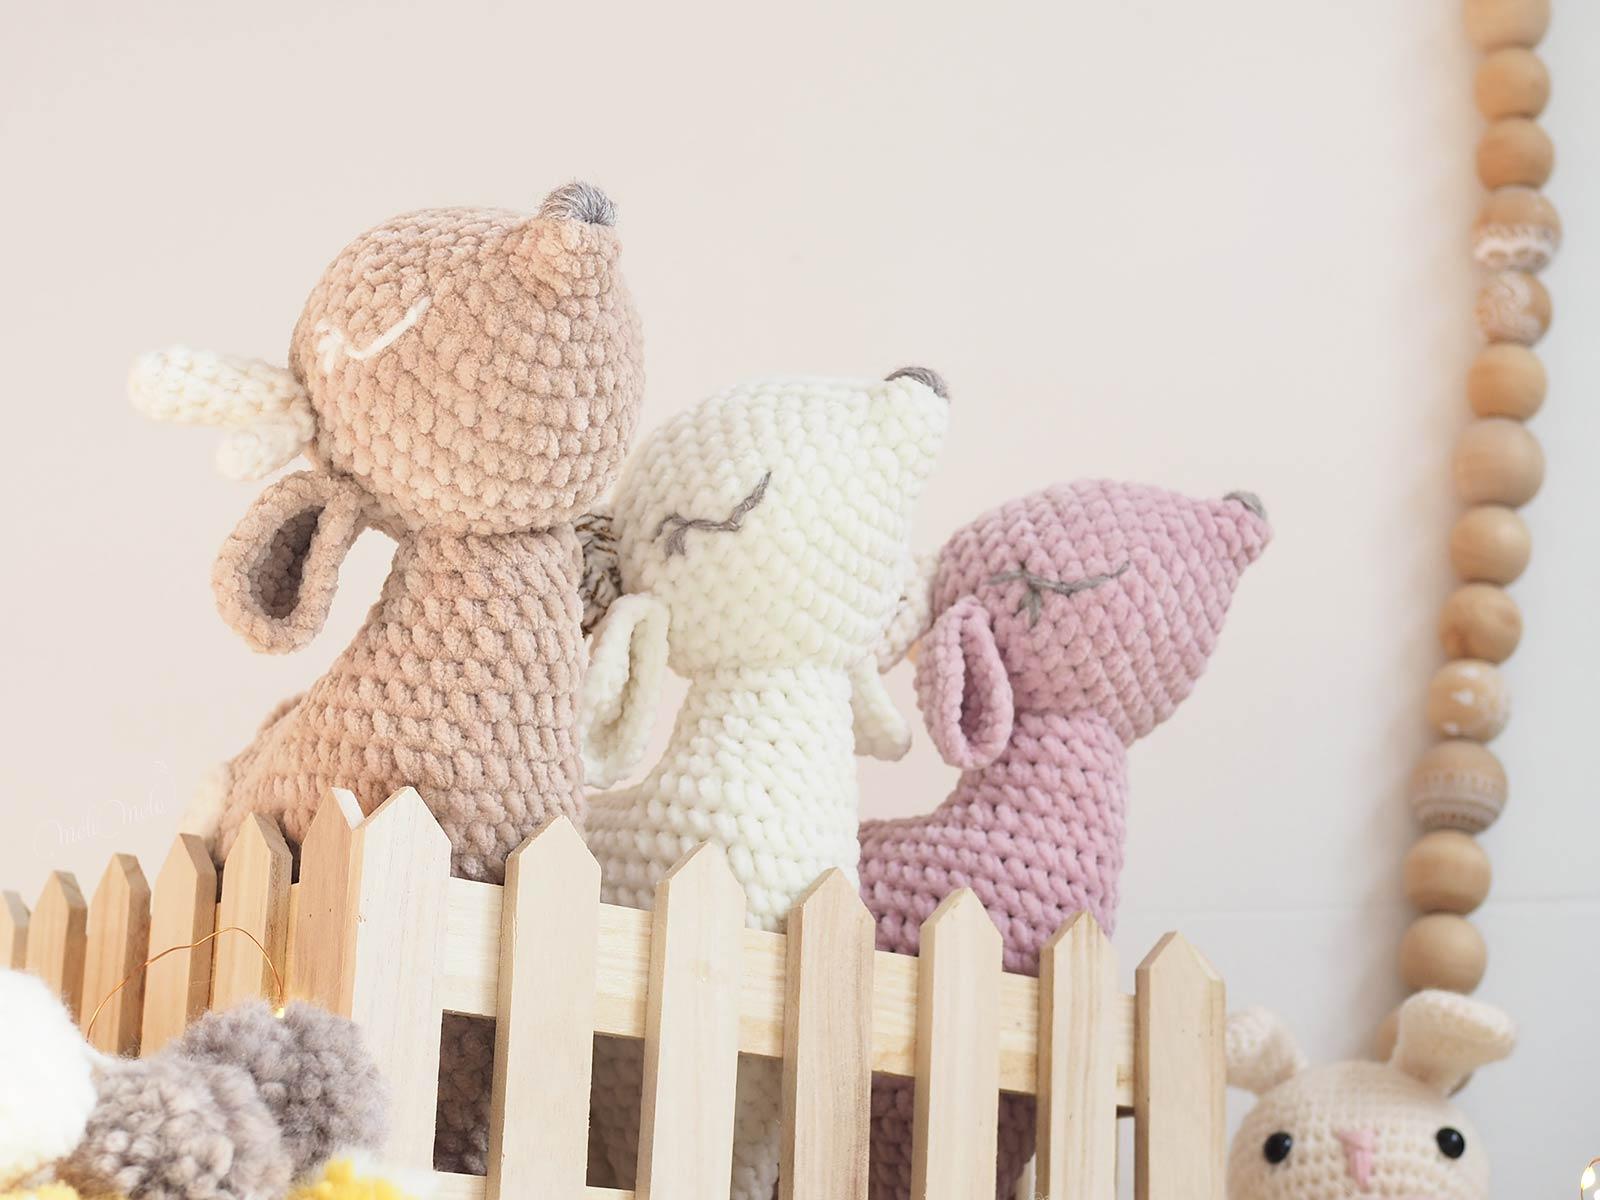 biches-bambi-doudou-amigurumi-crochet-laboutiquedemelimelo